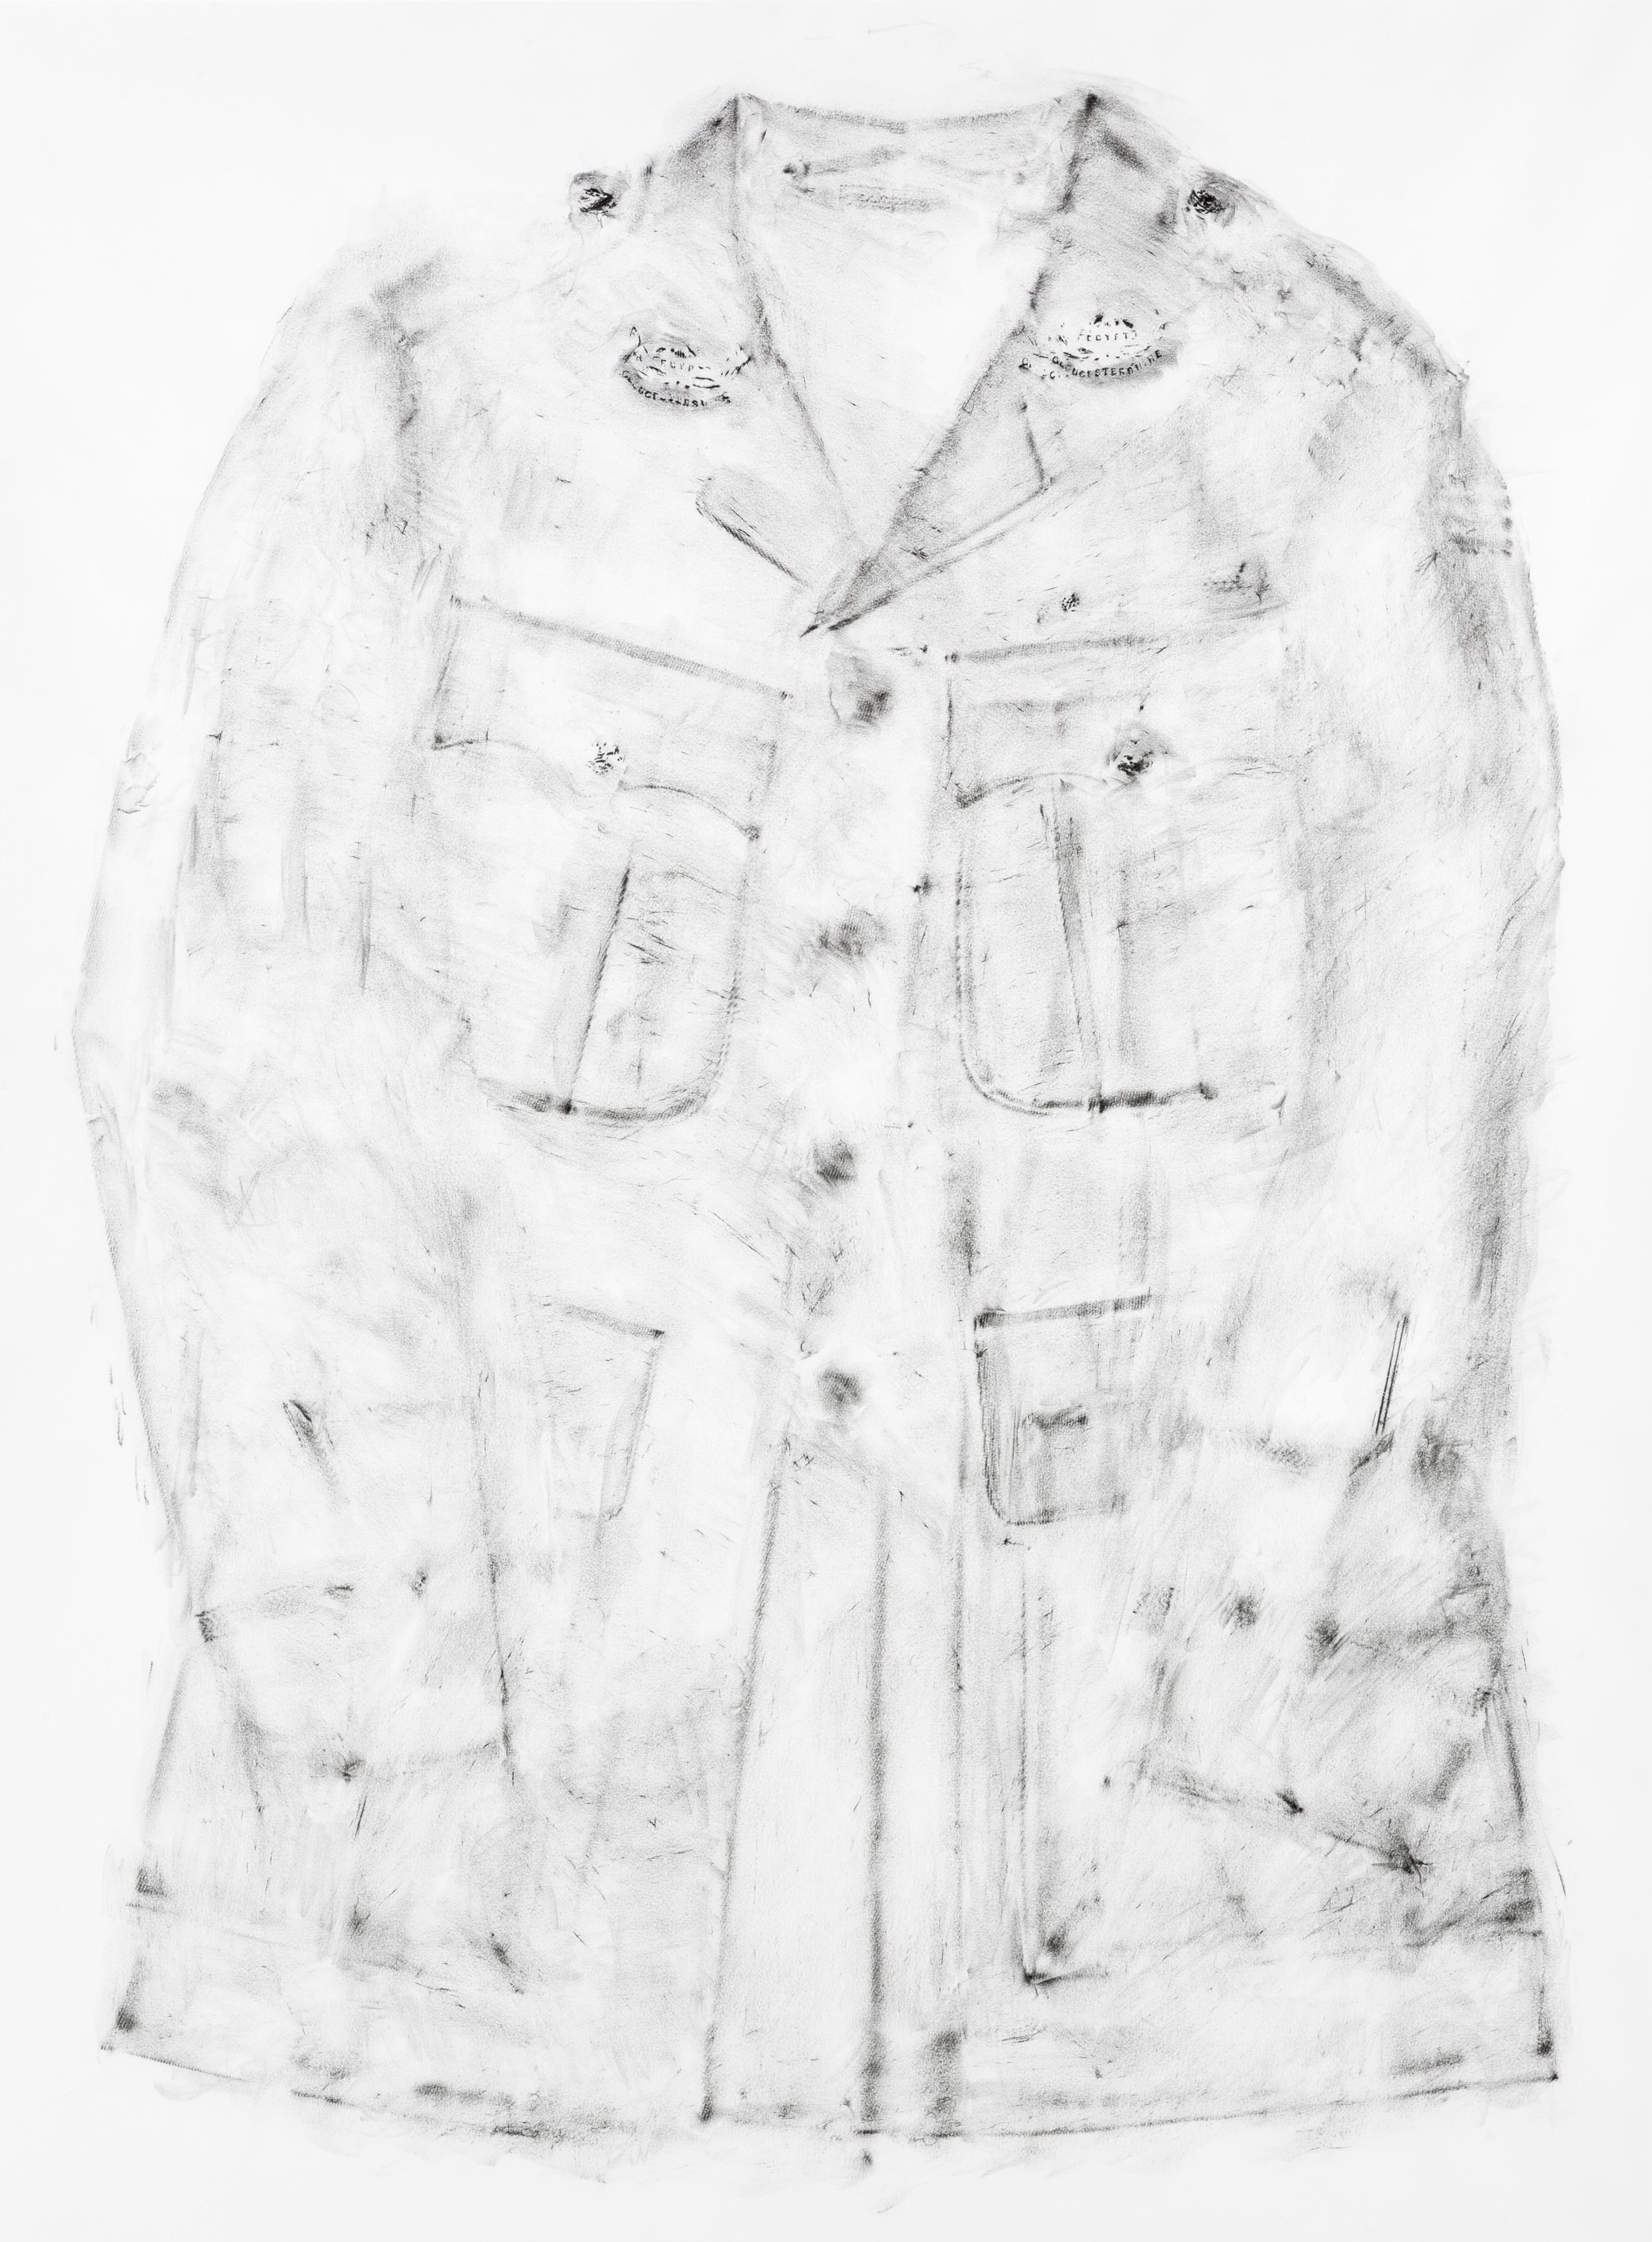 Rawlins 1918, 2011, 109 x 85, Graphite impression.